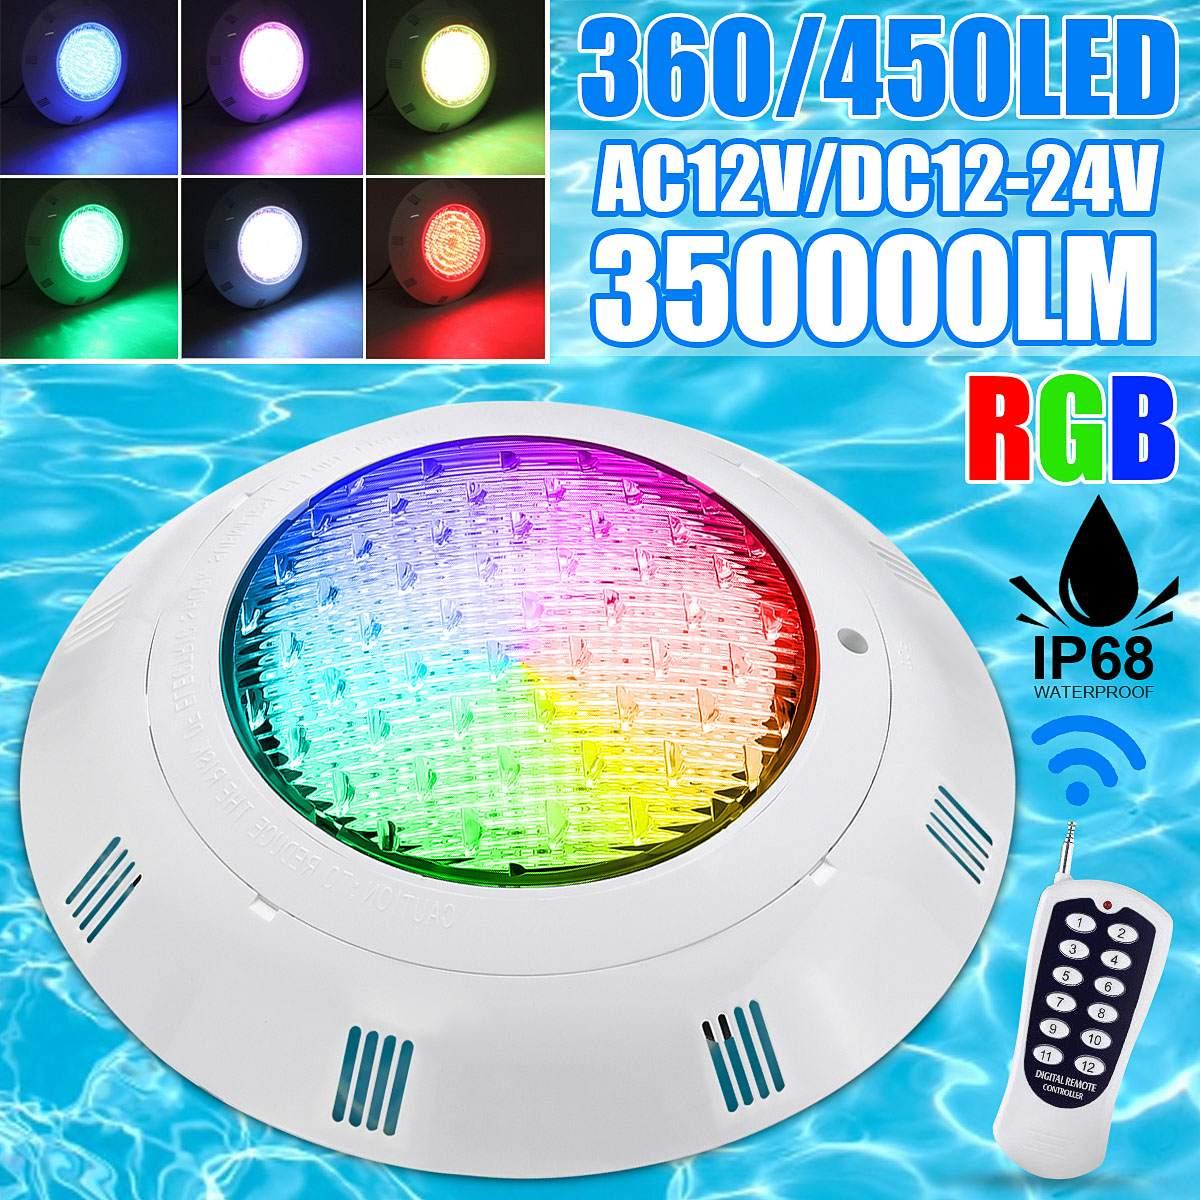 35W RGB Led Piscina Luz 360LED IP68 impermeable 360 LEDs al aire libre RGB Luz subacuática estanque Led Piscina Luz Spotlight Cámara de acción deportiva para exterior, Mini cámara subacuática, impermeable, pantalla de múltiples colores, resistente al agua, grabación de vídeo